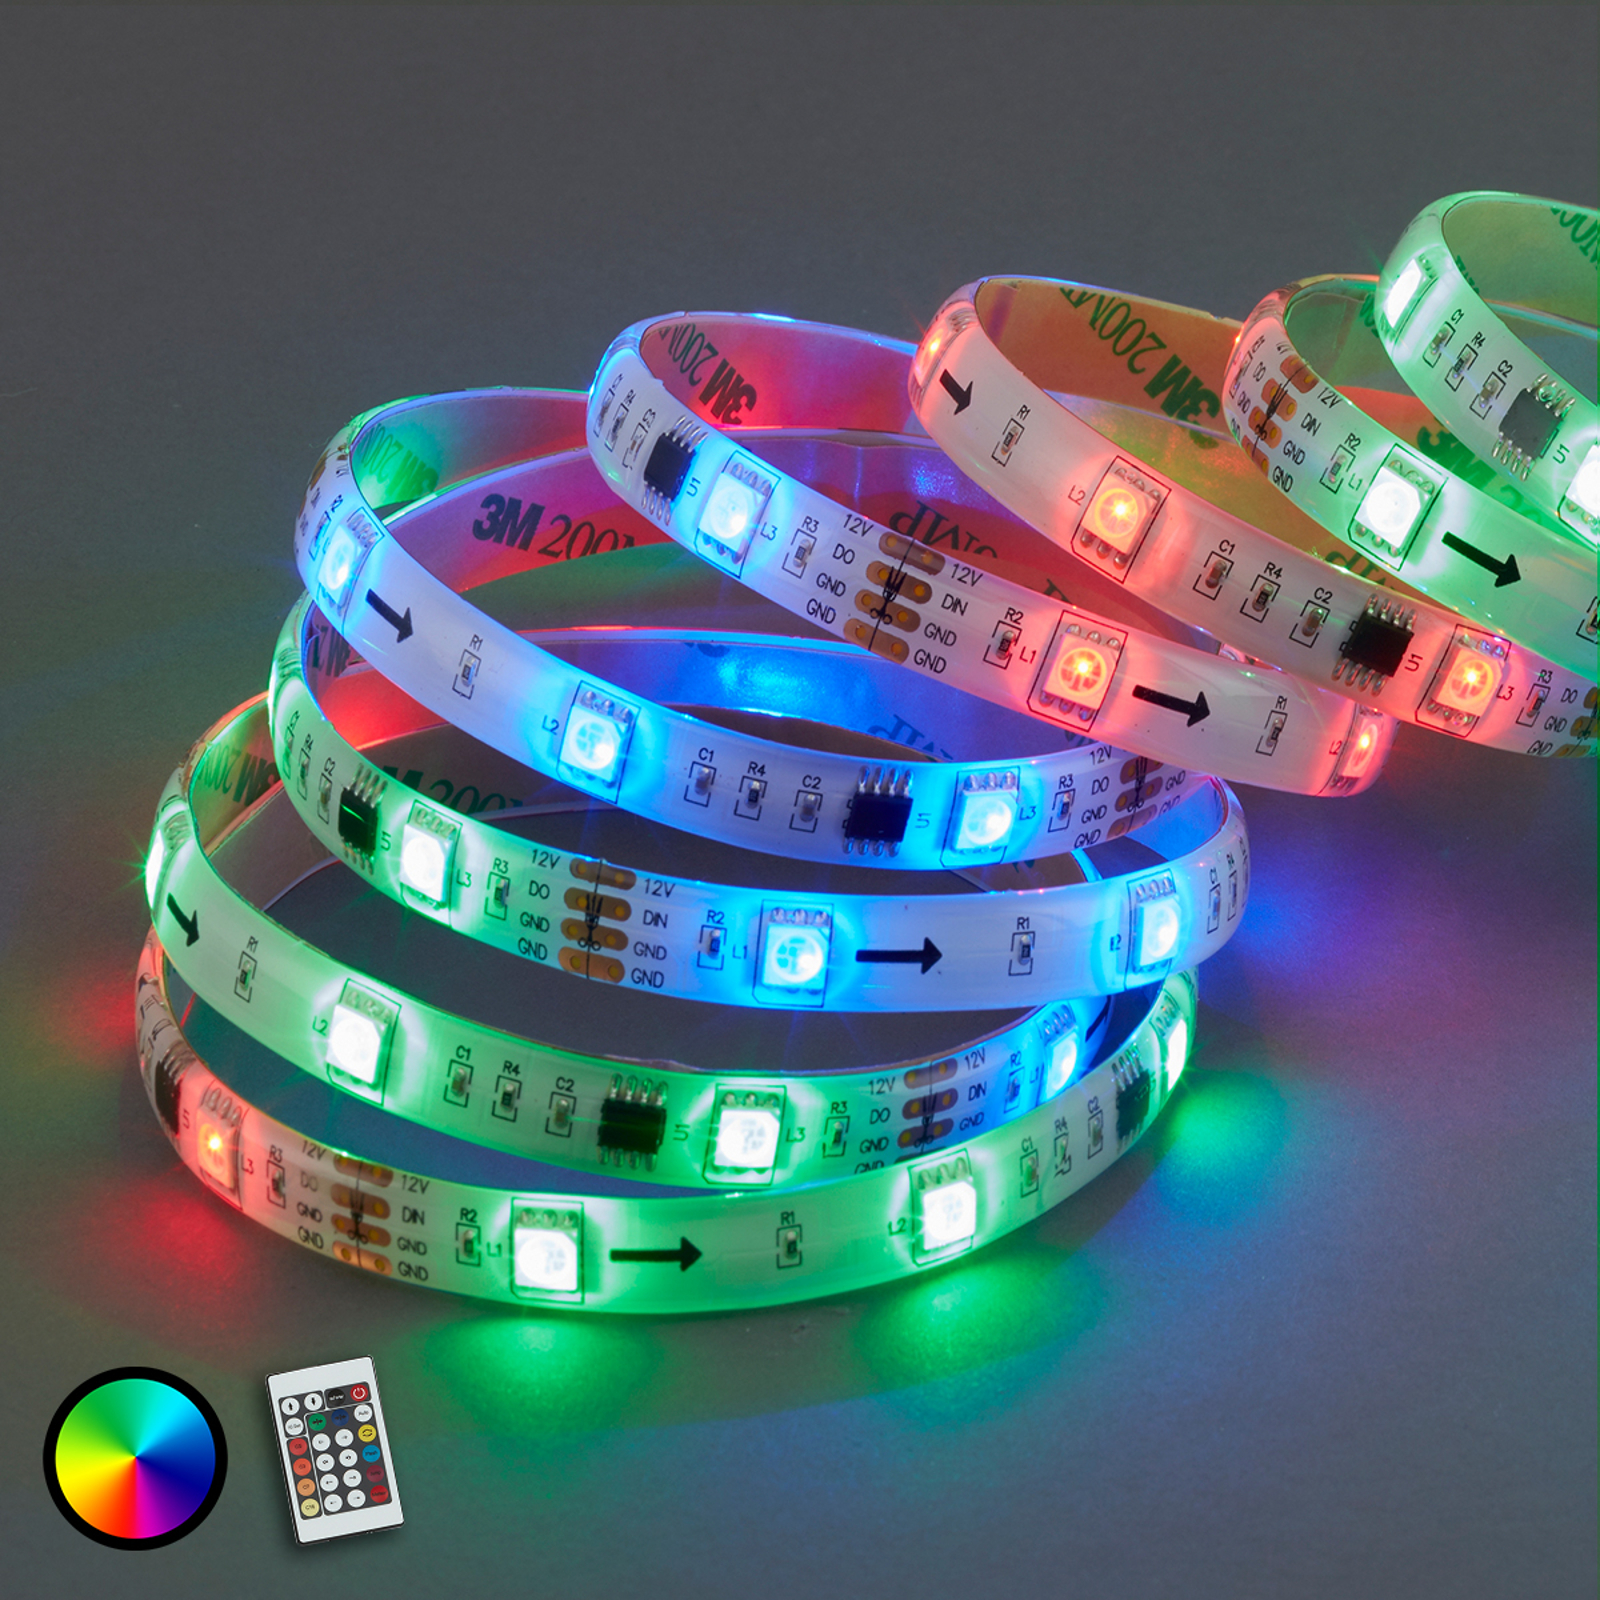 164 fonctions lumineuses - Ruban LED RVB Mo 500cm